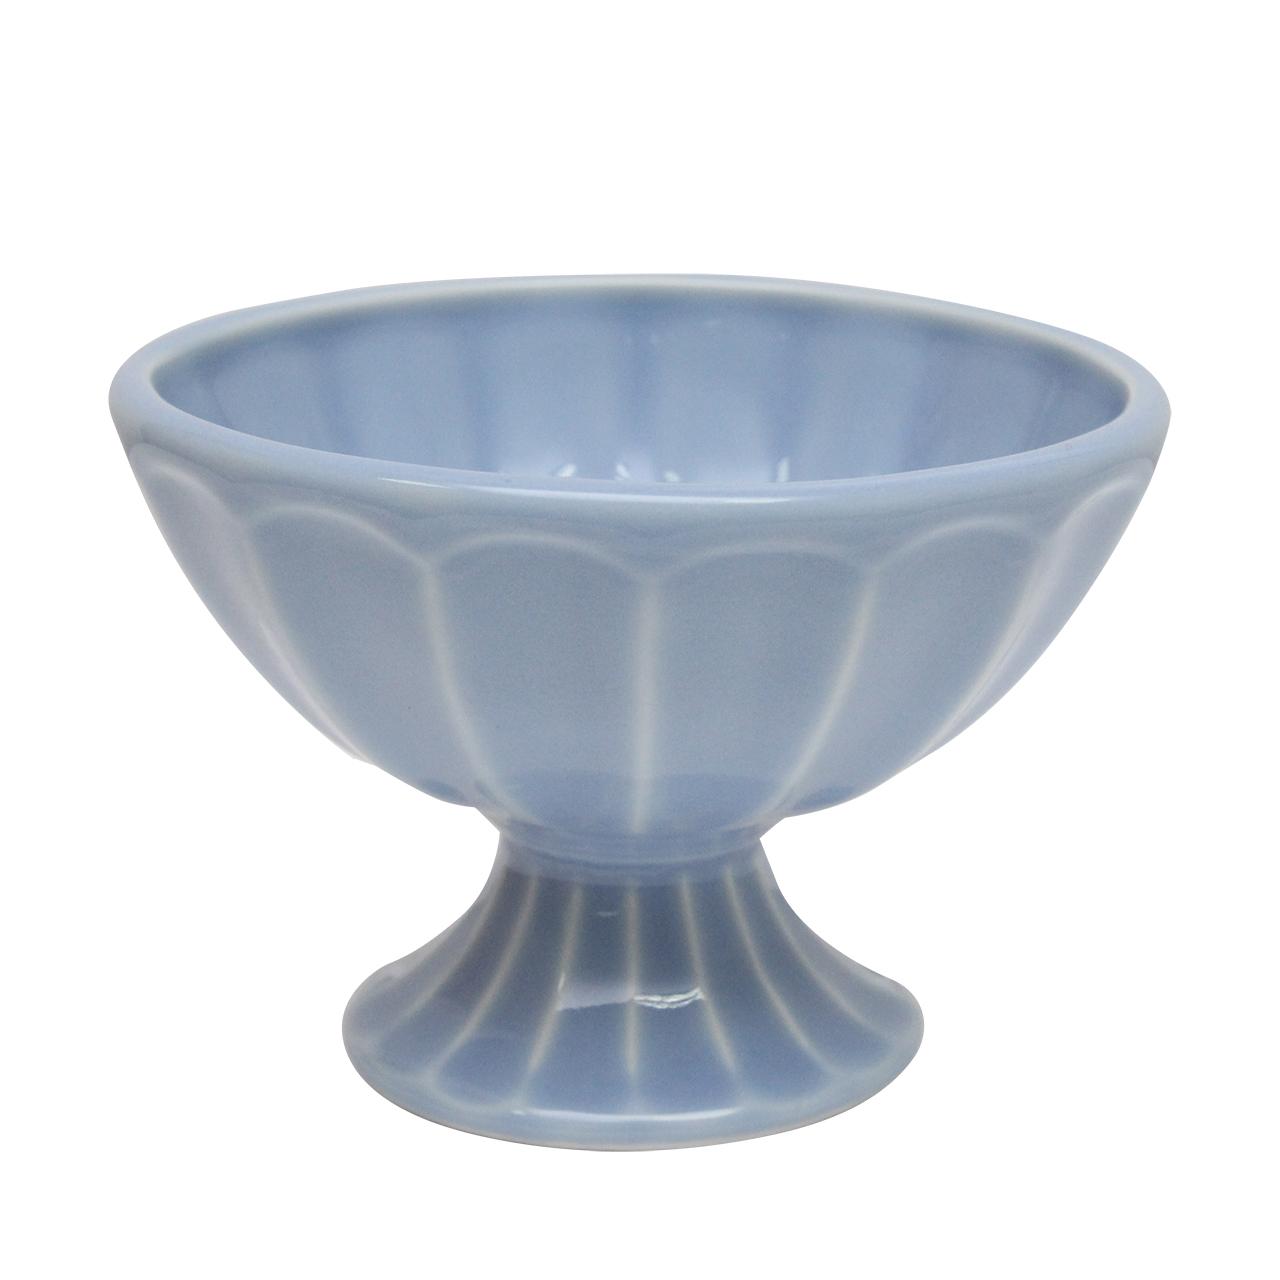 Cupa Din Ceramica Albastra Pentru Inghetata